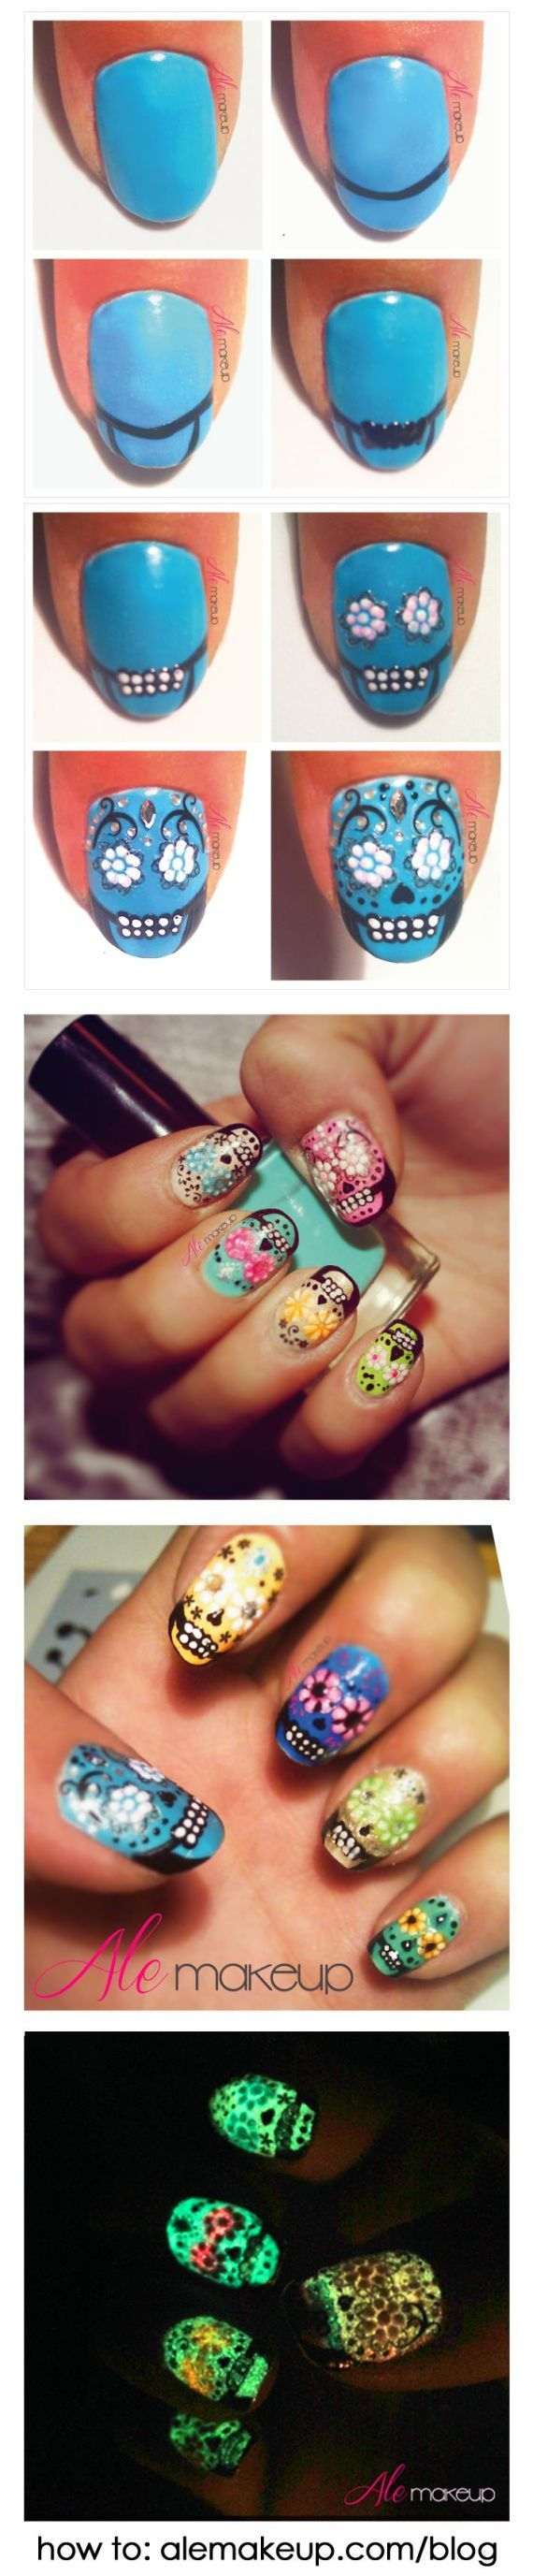 166 best Uñas artísticas images on Pinterest | Nail design, Nail art ...